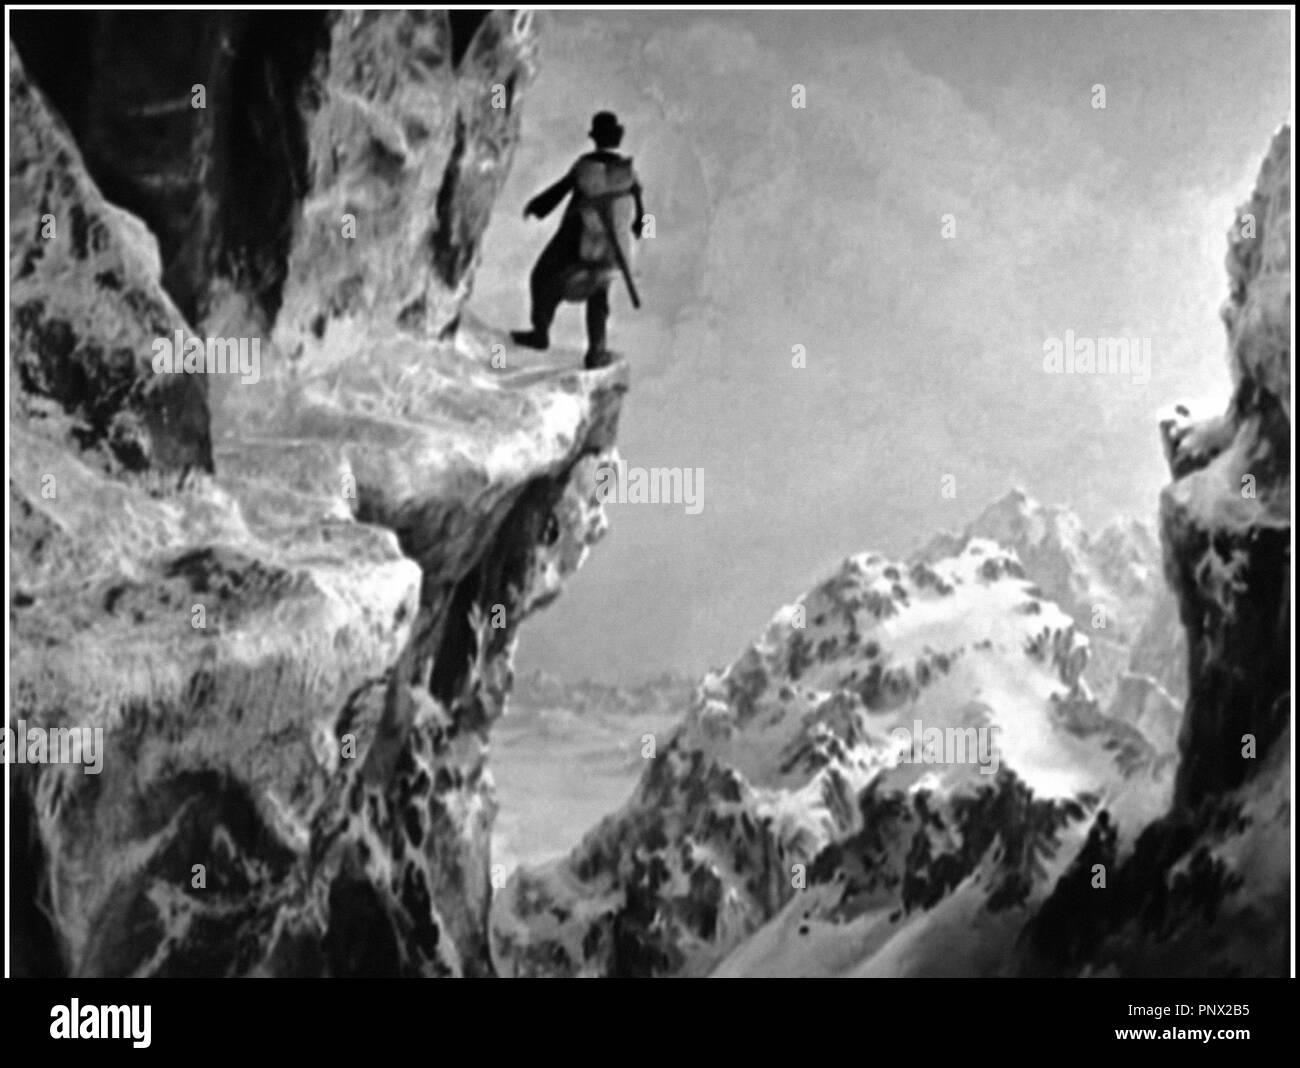 Prod DB © United Artists / DR LA RUEE VERS L'OR (THE GOLD RUSH) de Charles Chaplin 1925 USA avec Charles Chaplin comique, burlesque, Grand Nord, Klondike, classique muet , montagnen montagnard, alpinisme Charlie Chaplin, Charlot Stock Photo